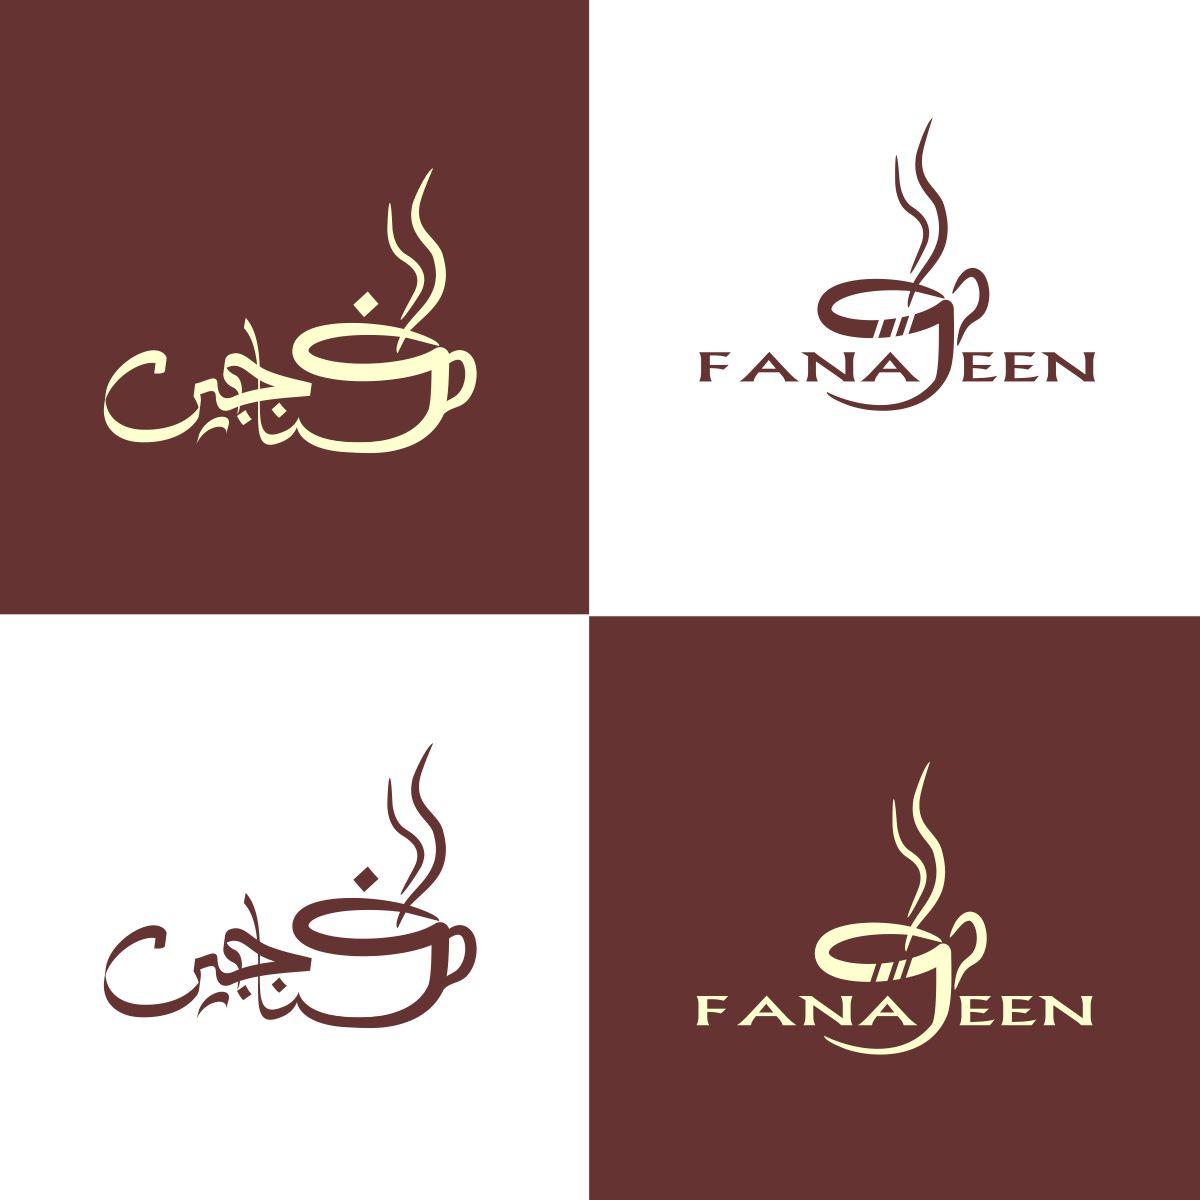 coffee shop logo design for fanajeen by aisrafa design